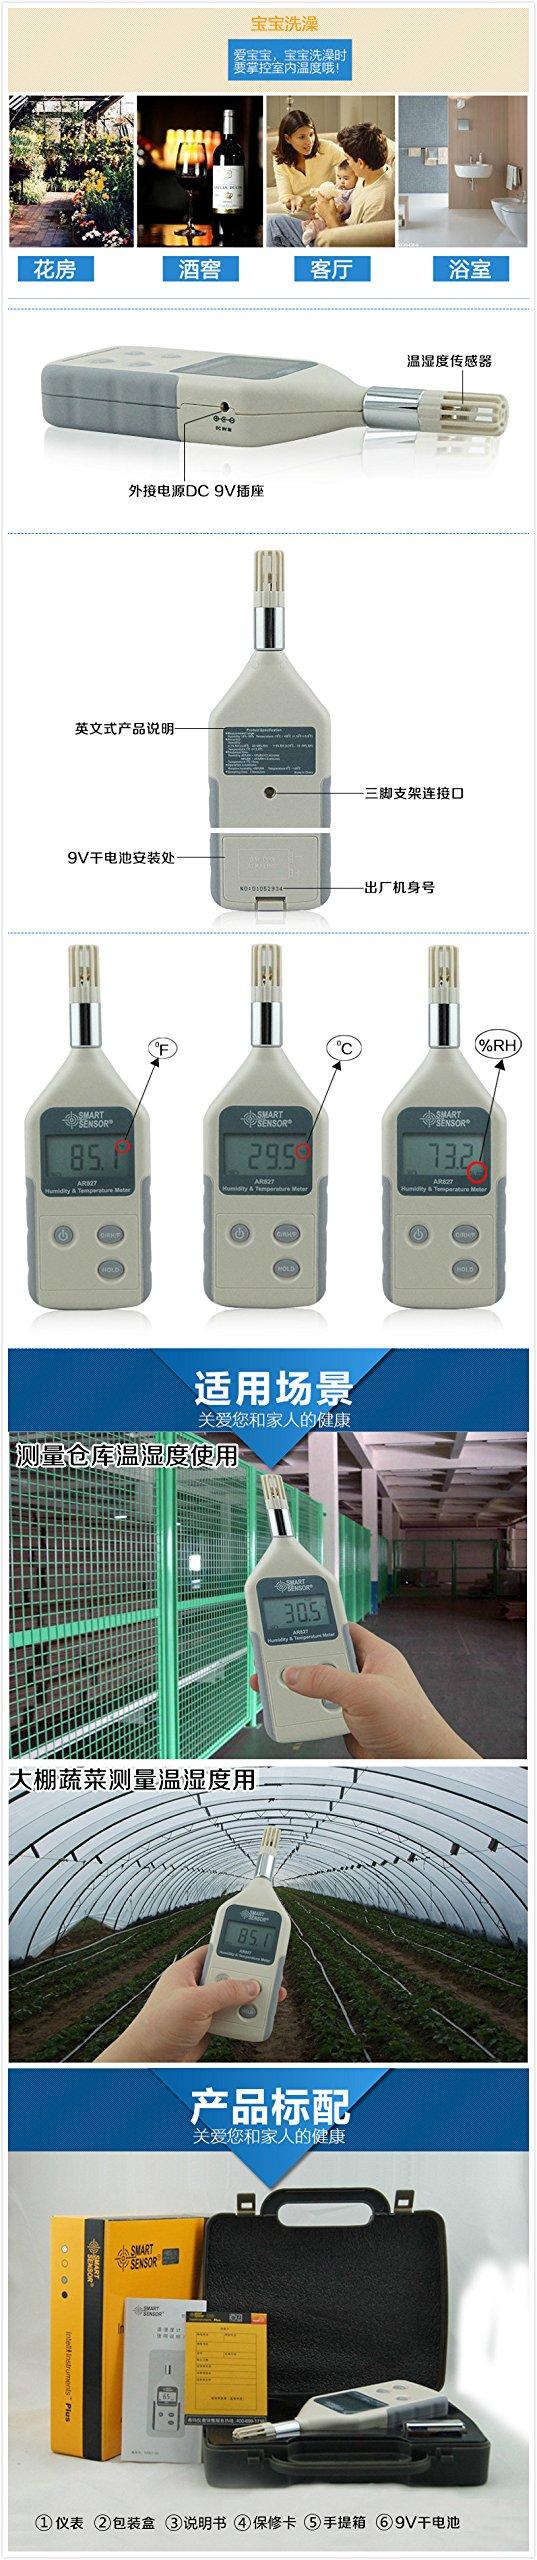 AR827 Digital Industrial Hygrometer Humidity Temperature Meter measure range 10%RH~99%RH